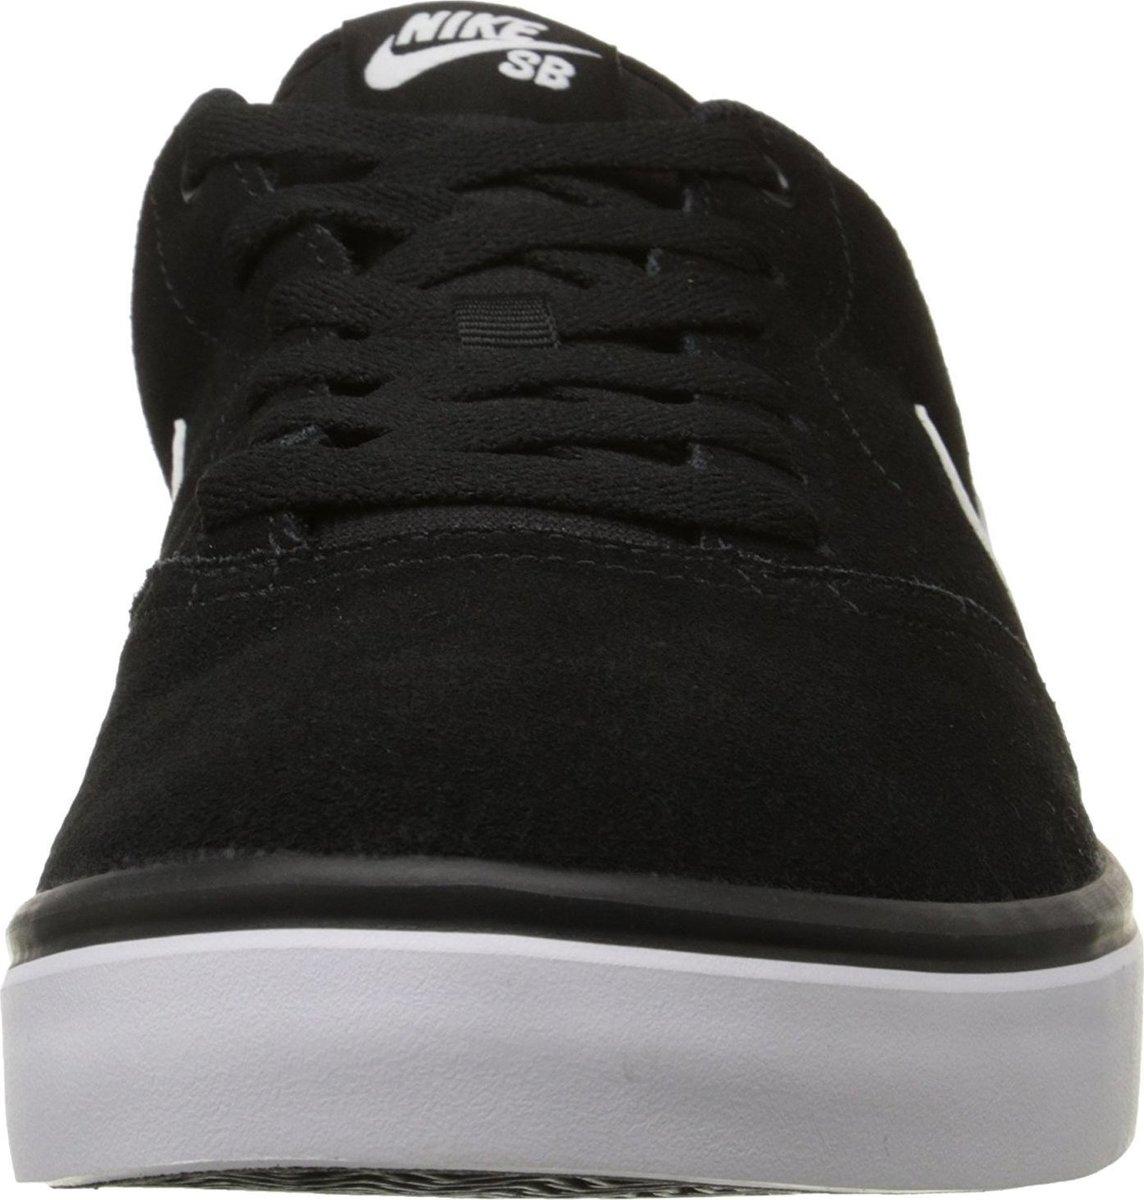 65cc71a865 Nike SB Check Solar 843895-001 - Skroutz.gr